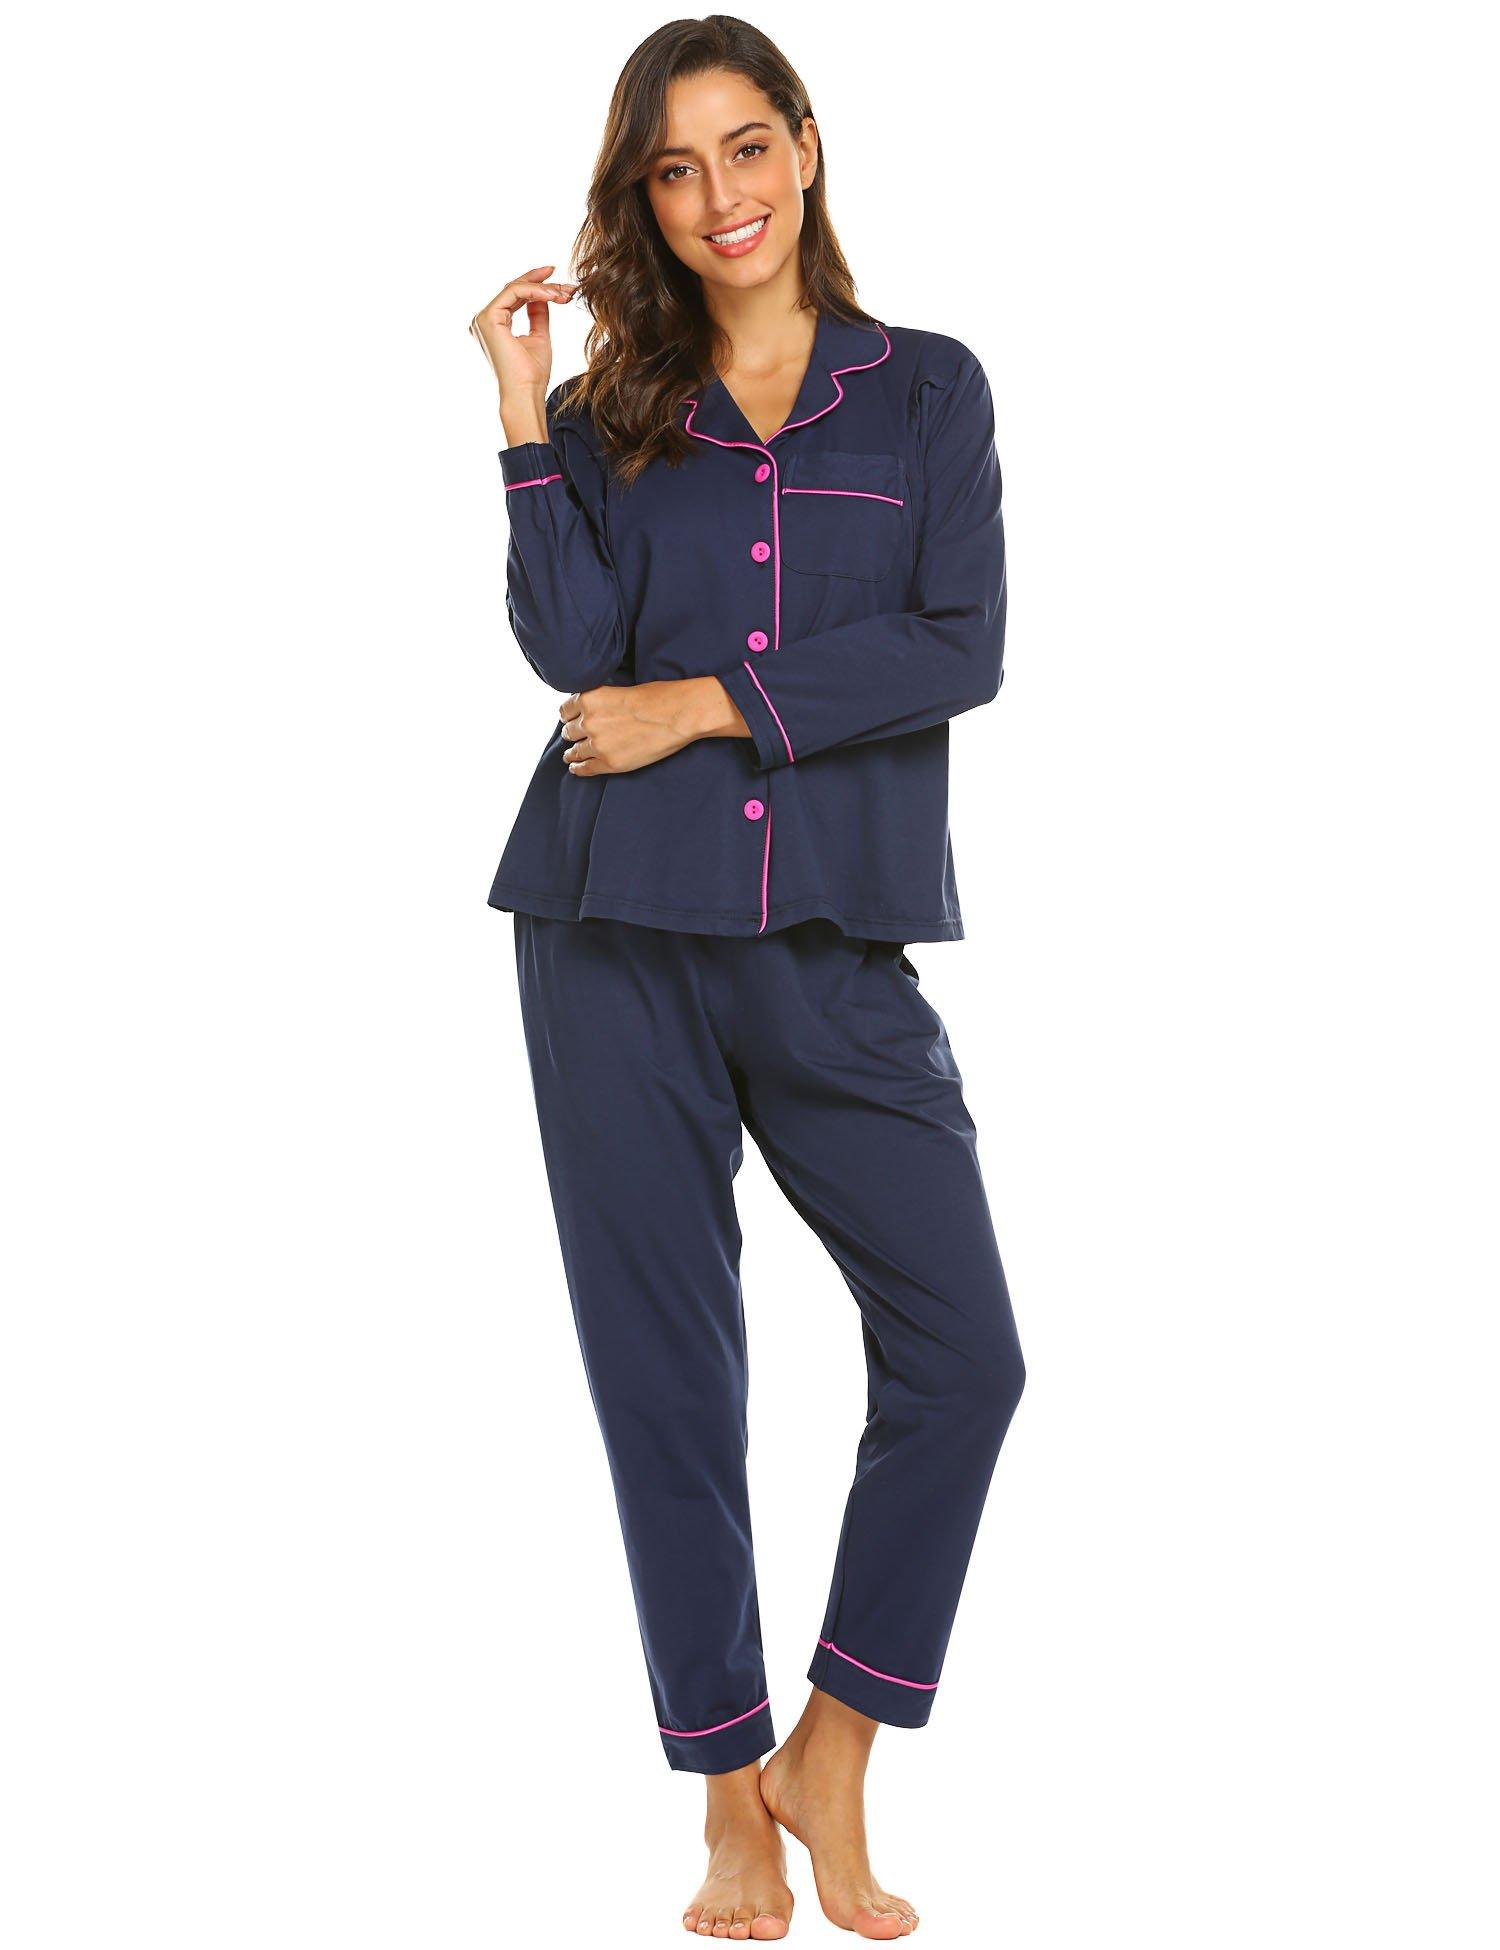 Ekouaer Womens Maternity Nursing Cotton Pajamas Breastfeeding Sleepwear Set, Navy Blue, Medium